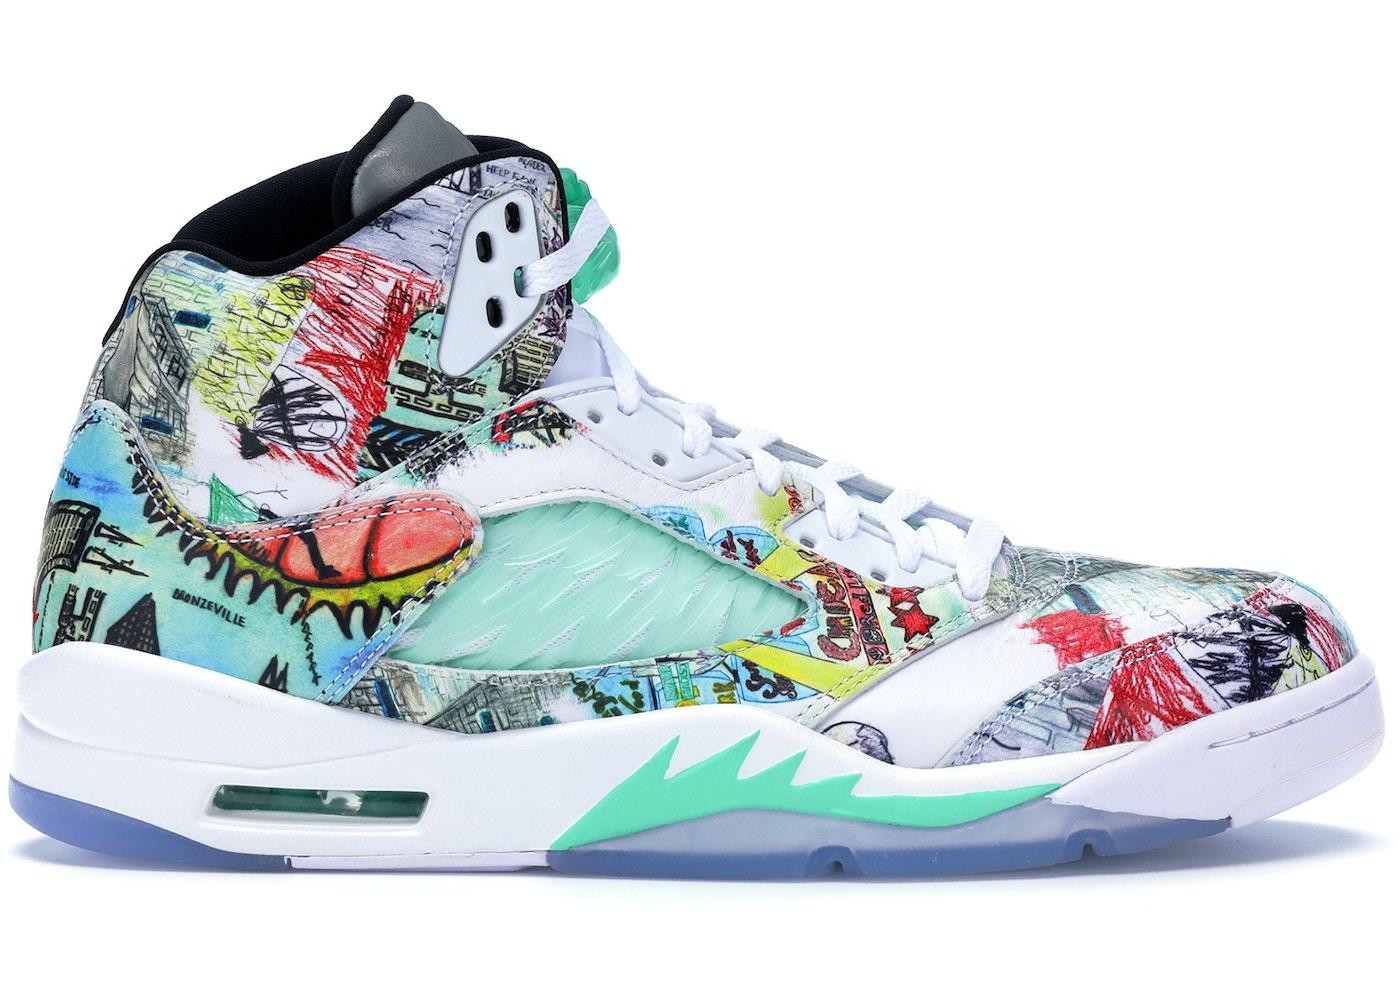 c82e9837a60 Buy Air Jordan 5 Shoes & Deadstock Sneakers